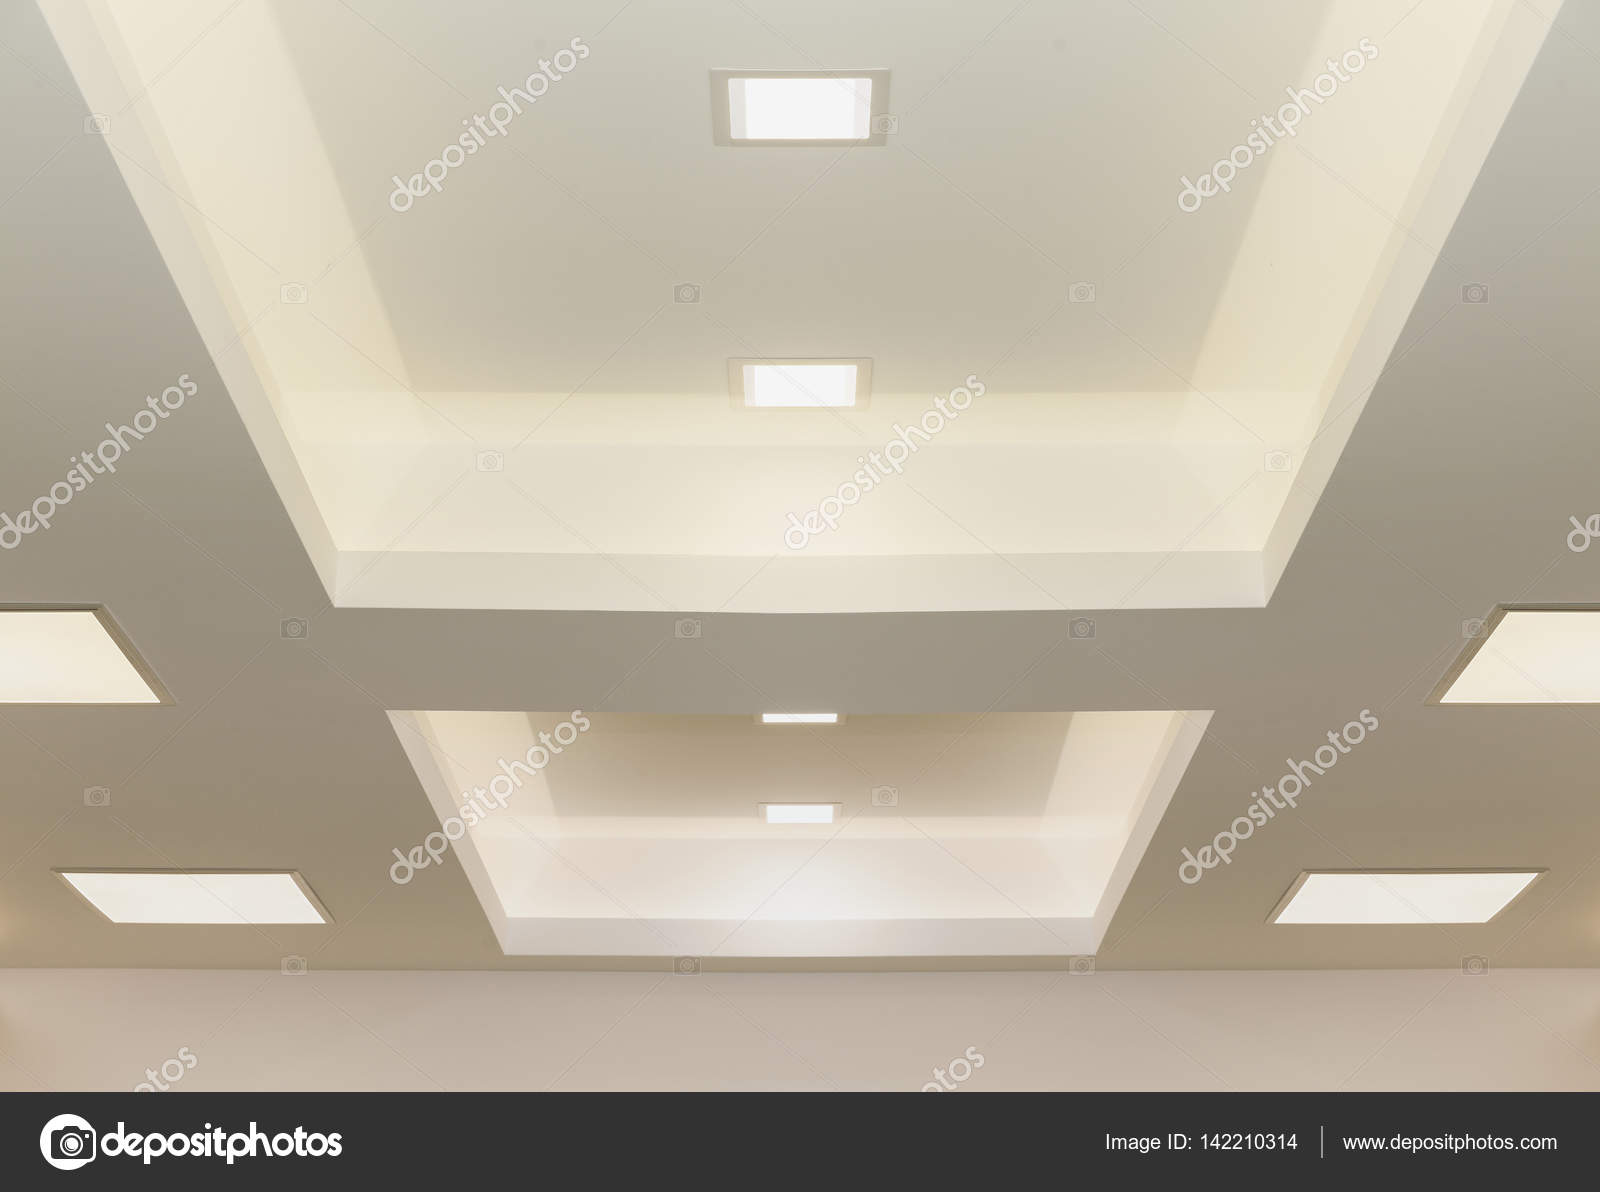 moderne plafond verlichting — Stockfoto © DJSrki #142210314